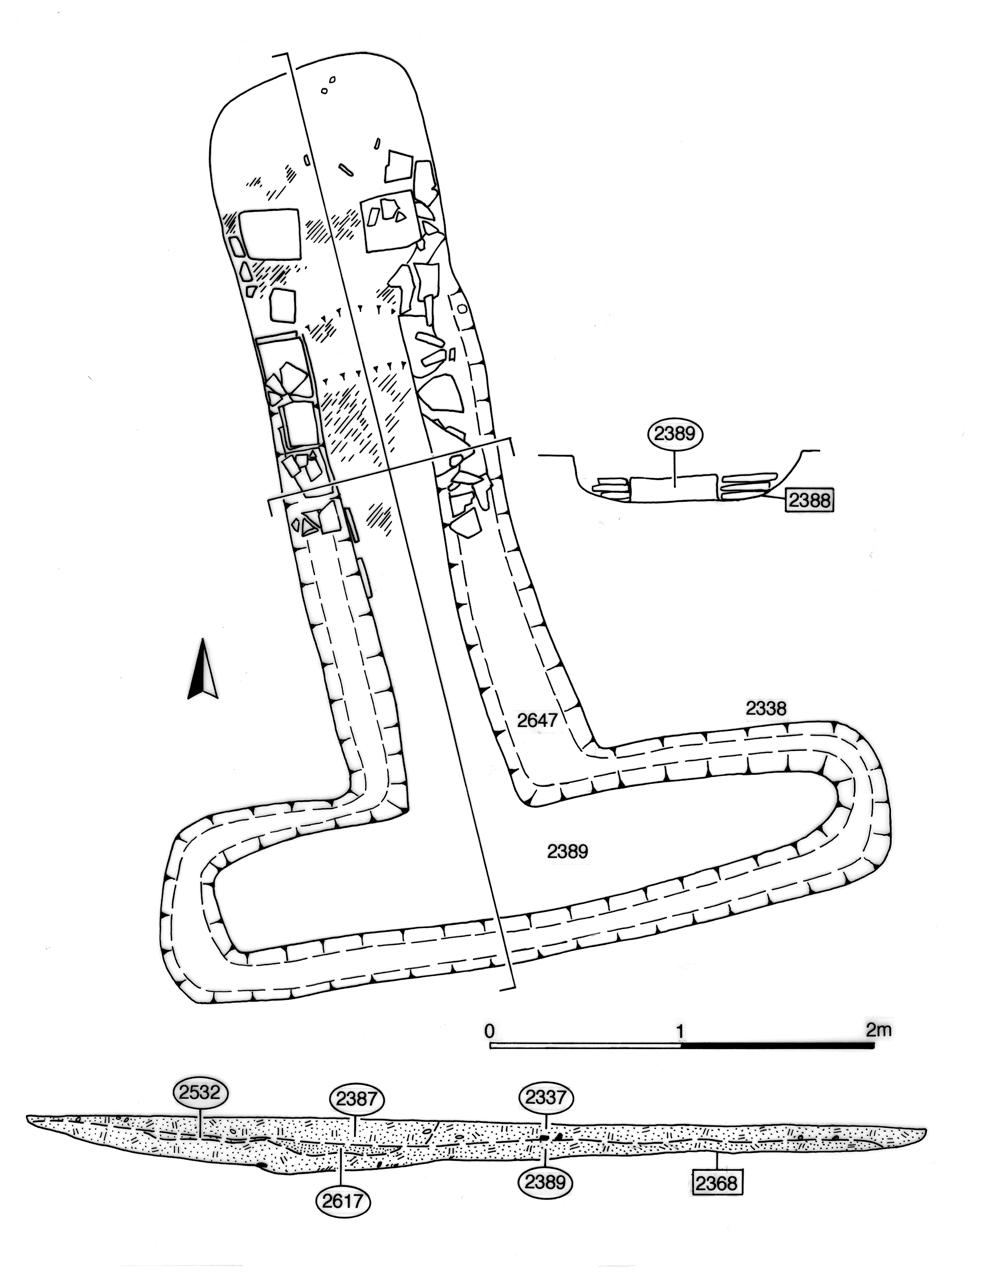 roman 150 cc wiring diagram database Tao Tao 150Cc internet archaeol 40 atkinson and preston period 4 mid roman chelsea 150cc figure 165